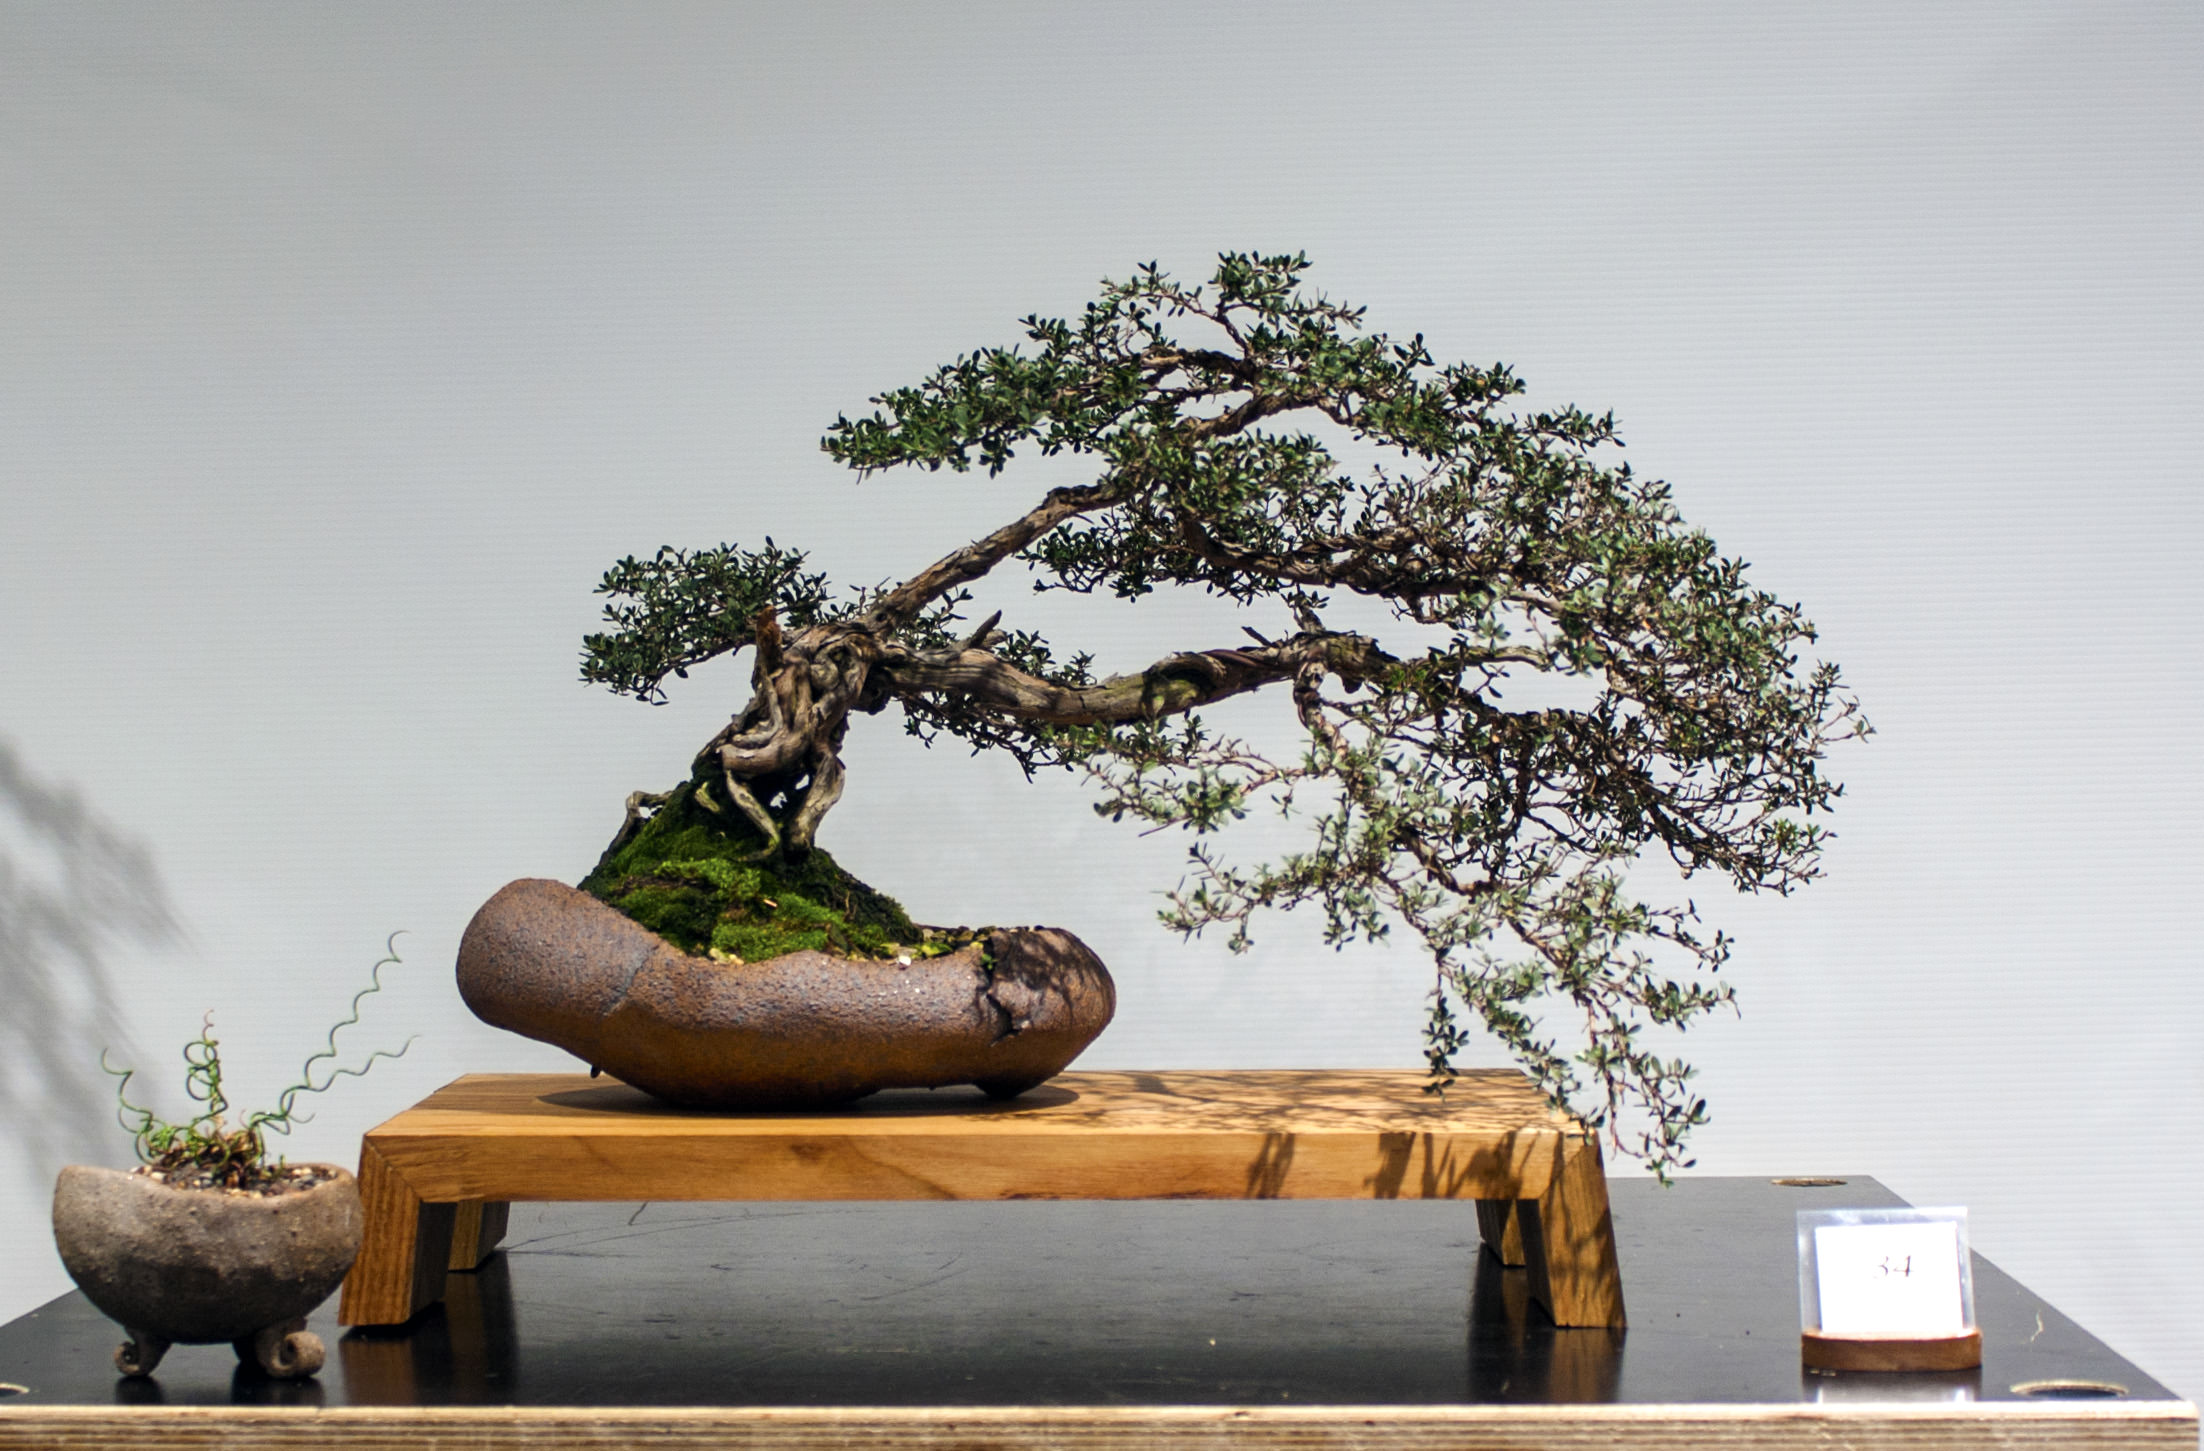 34 Leptospermum rupestre, Alpine tea tree